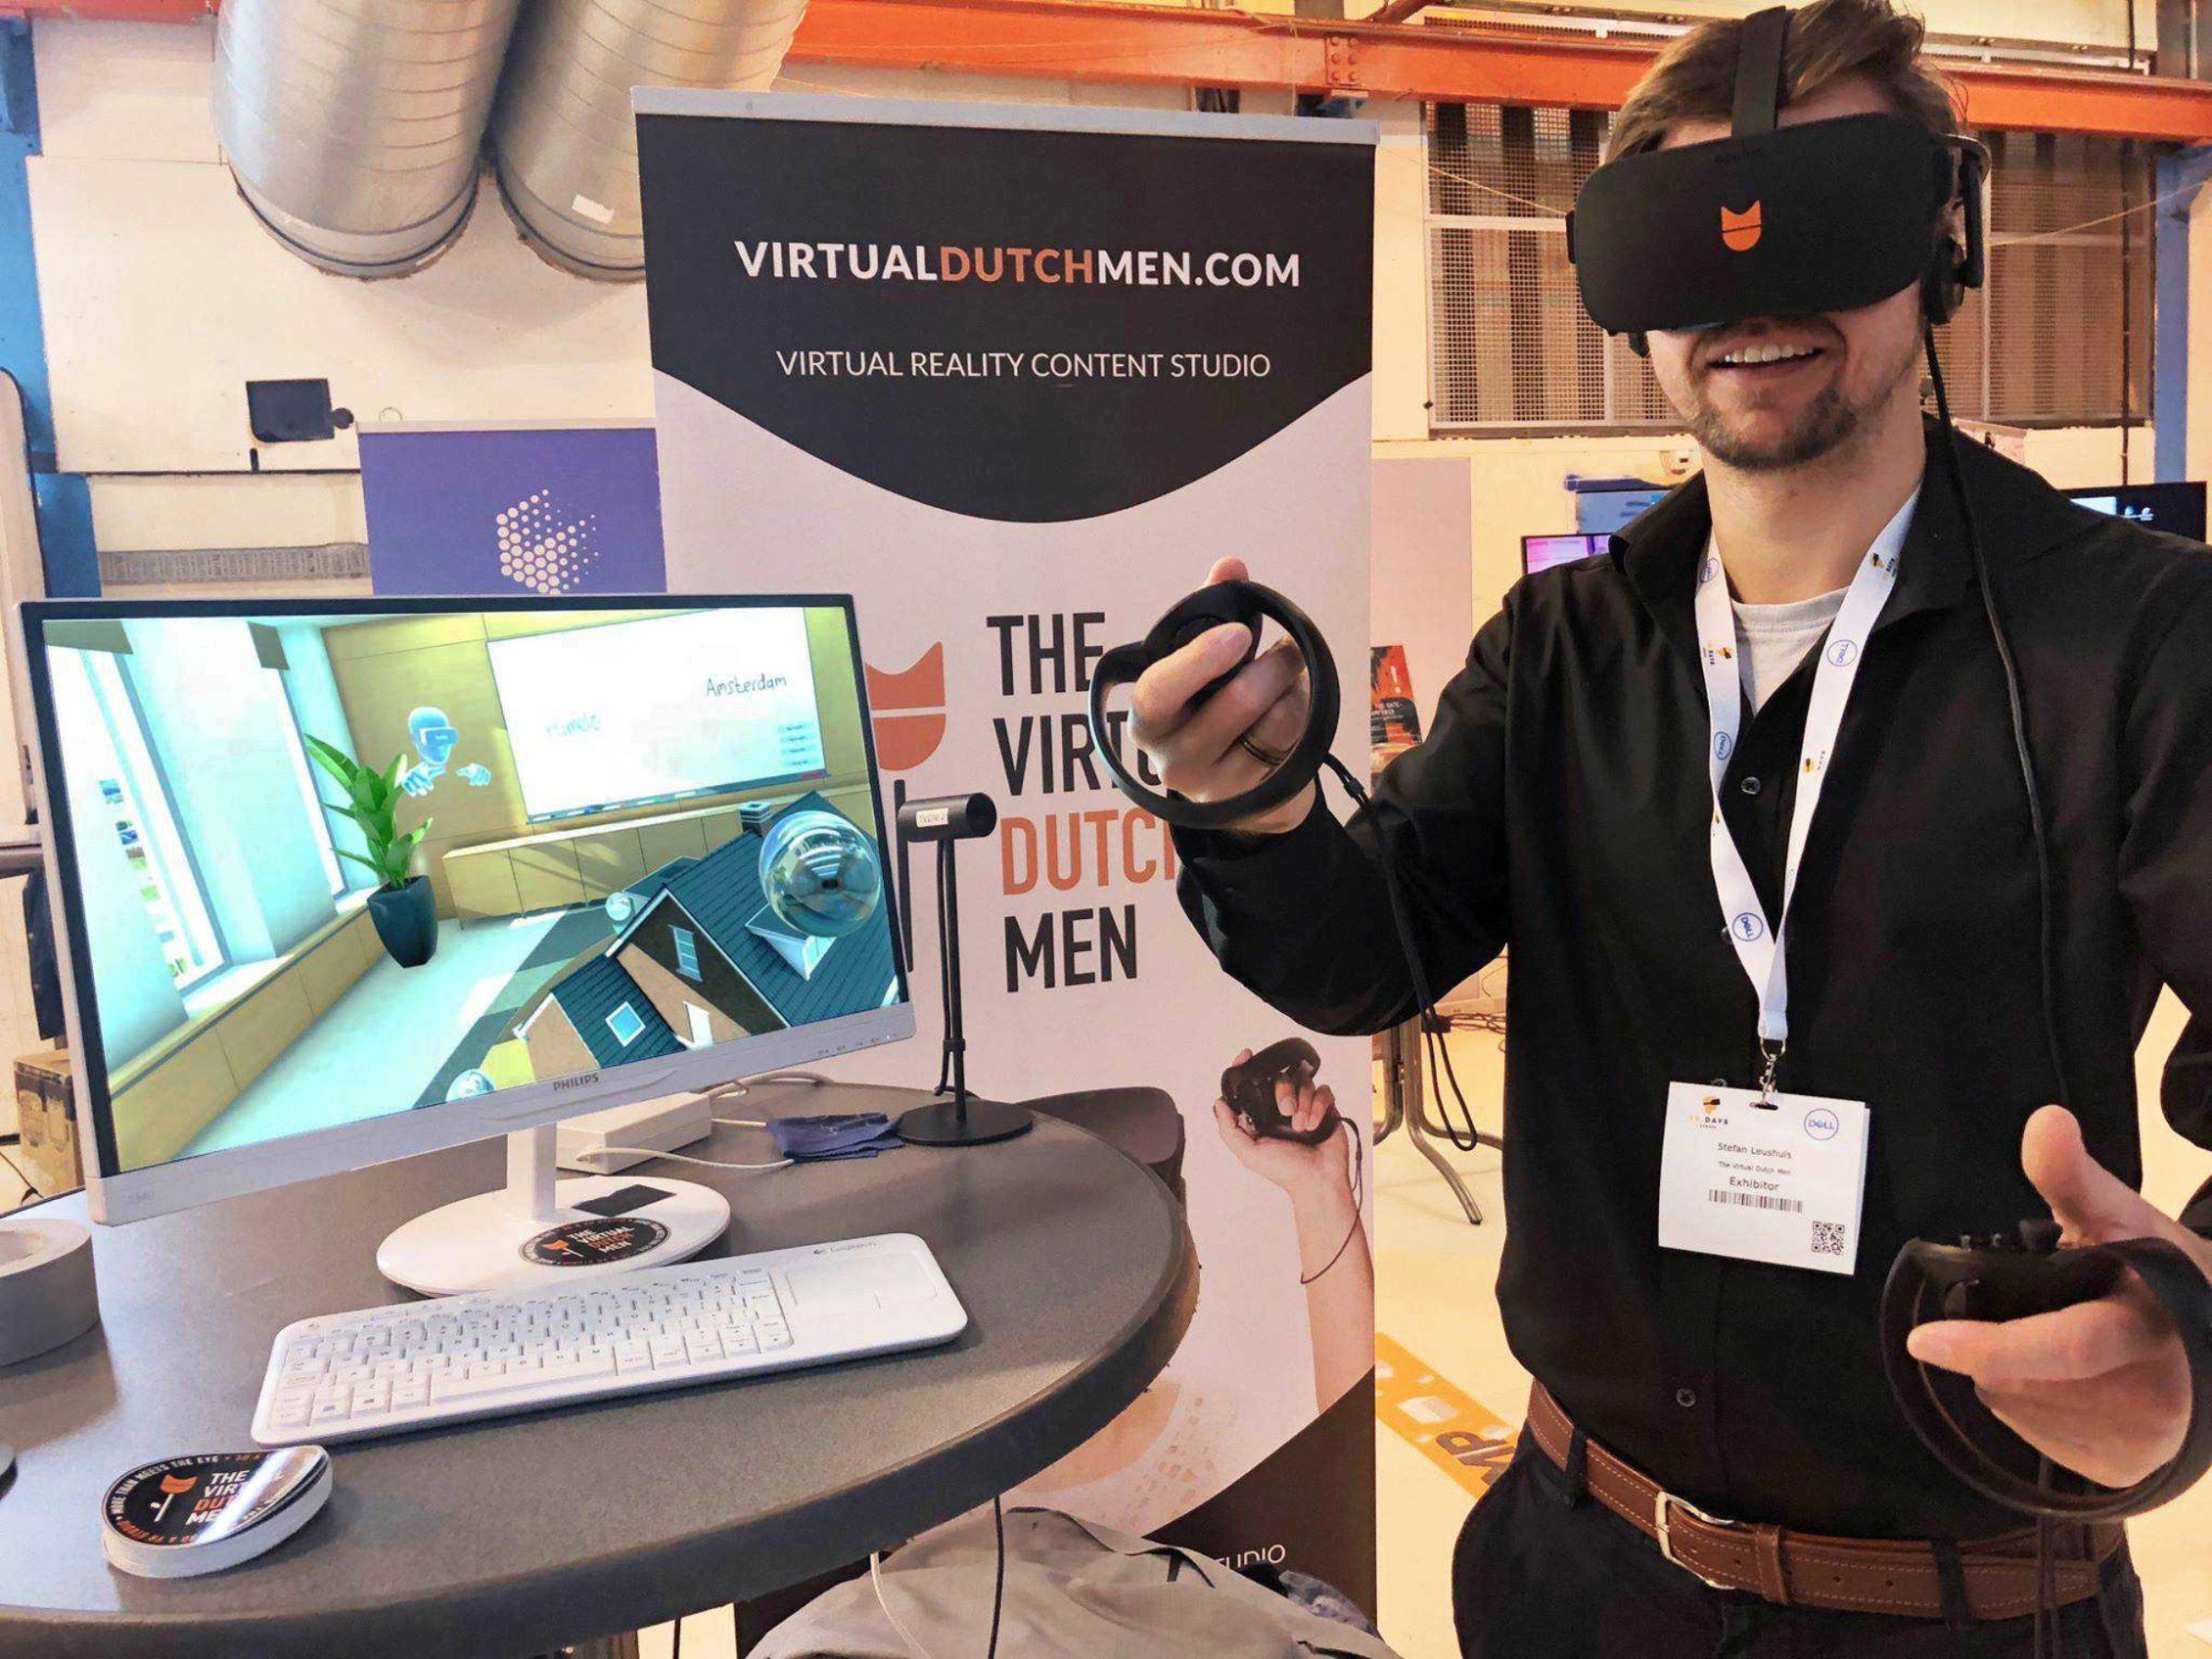 The Virtual Dutchmen